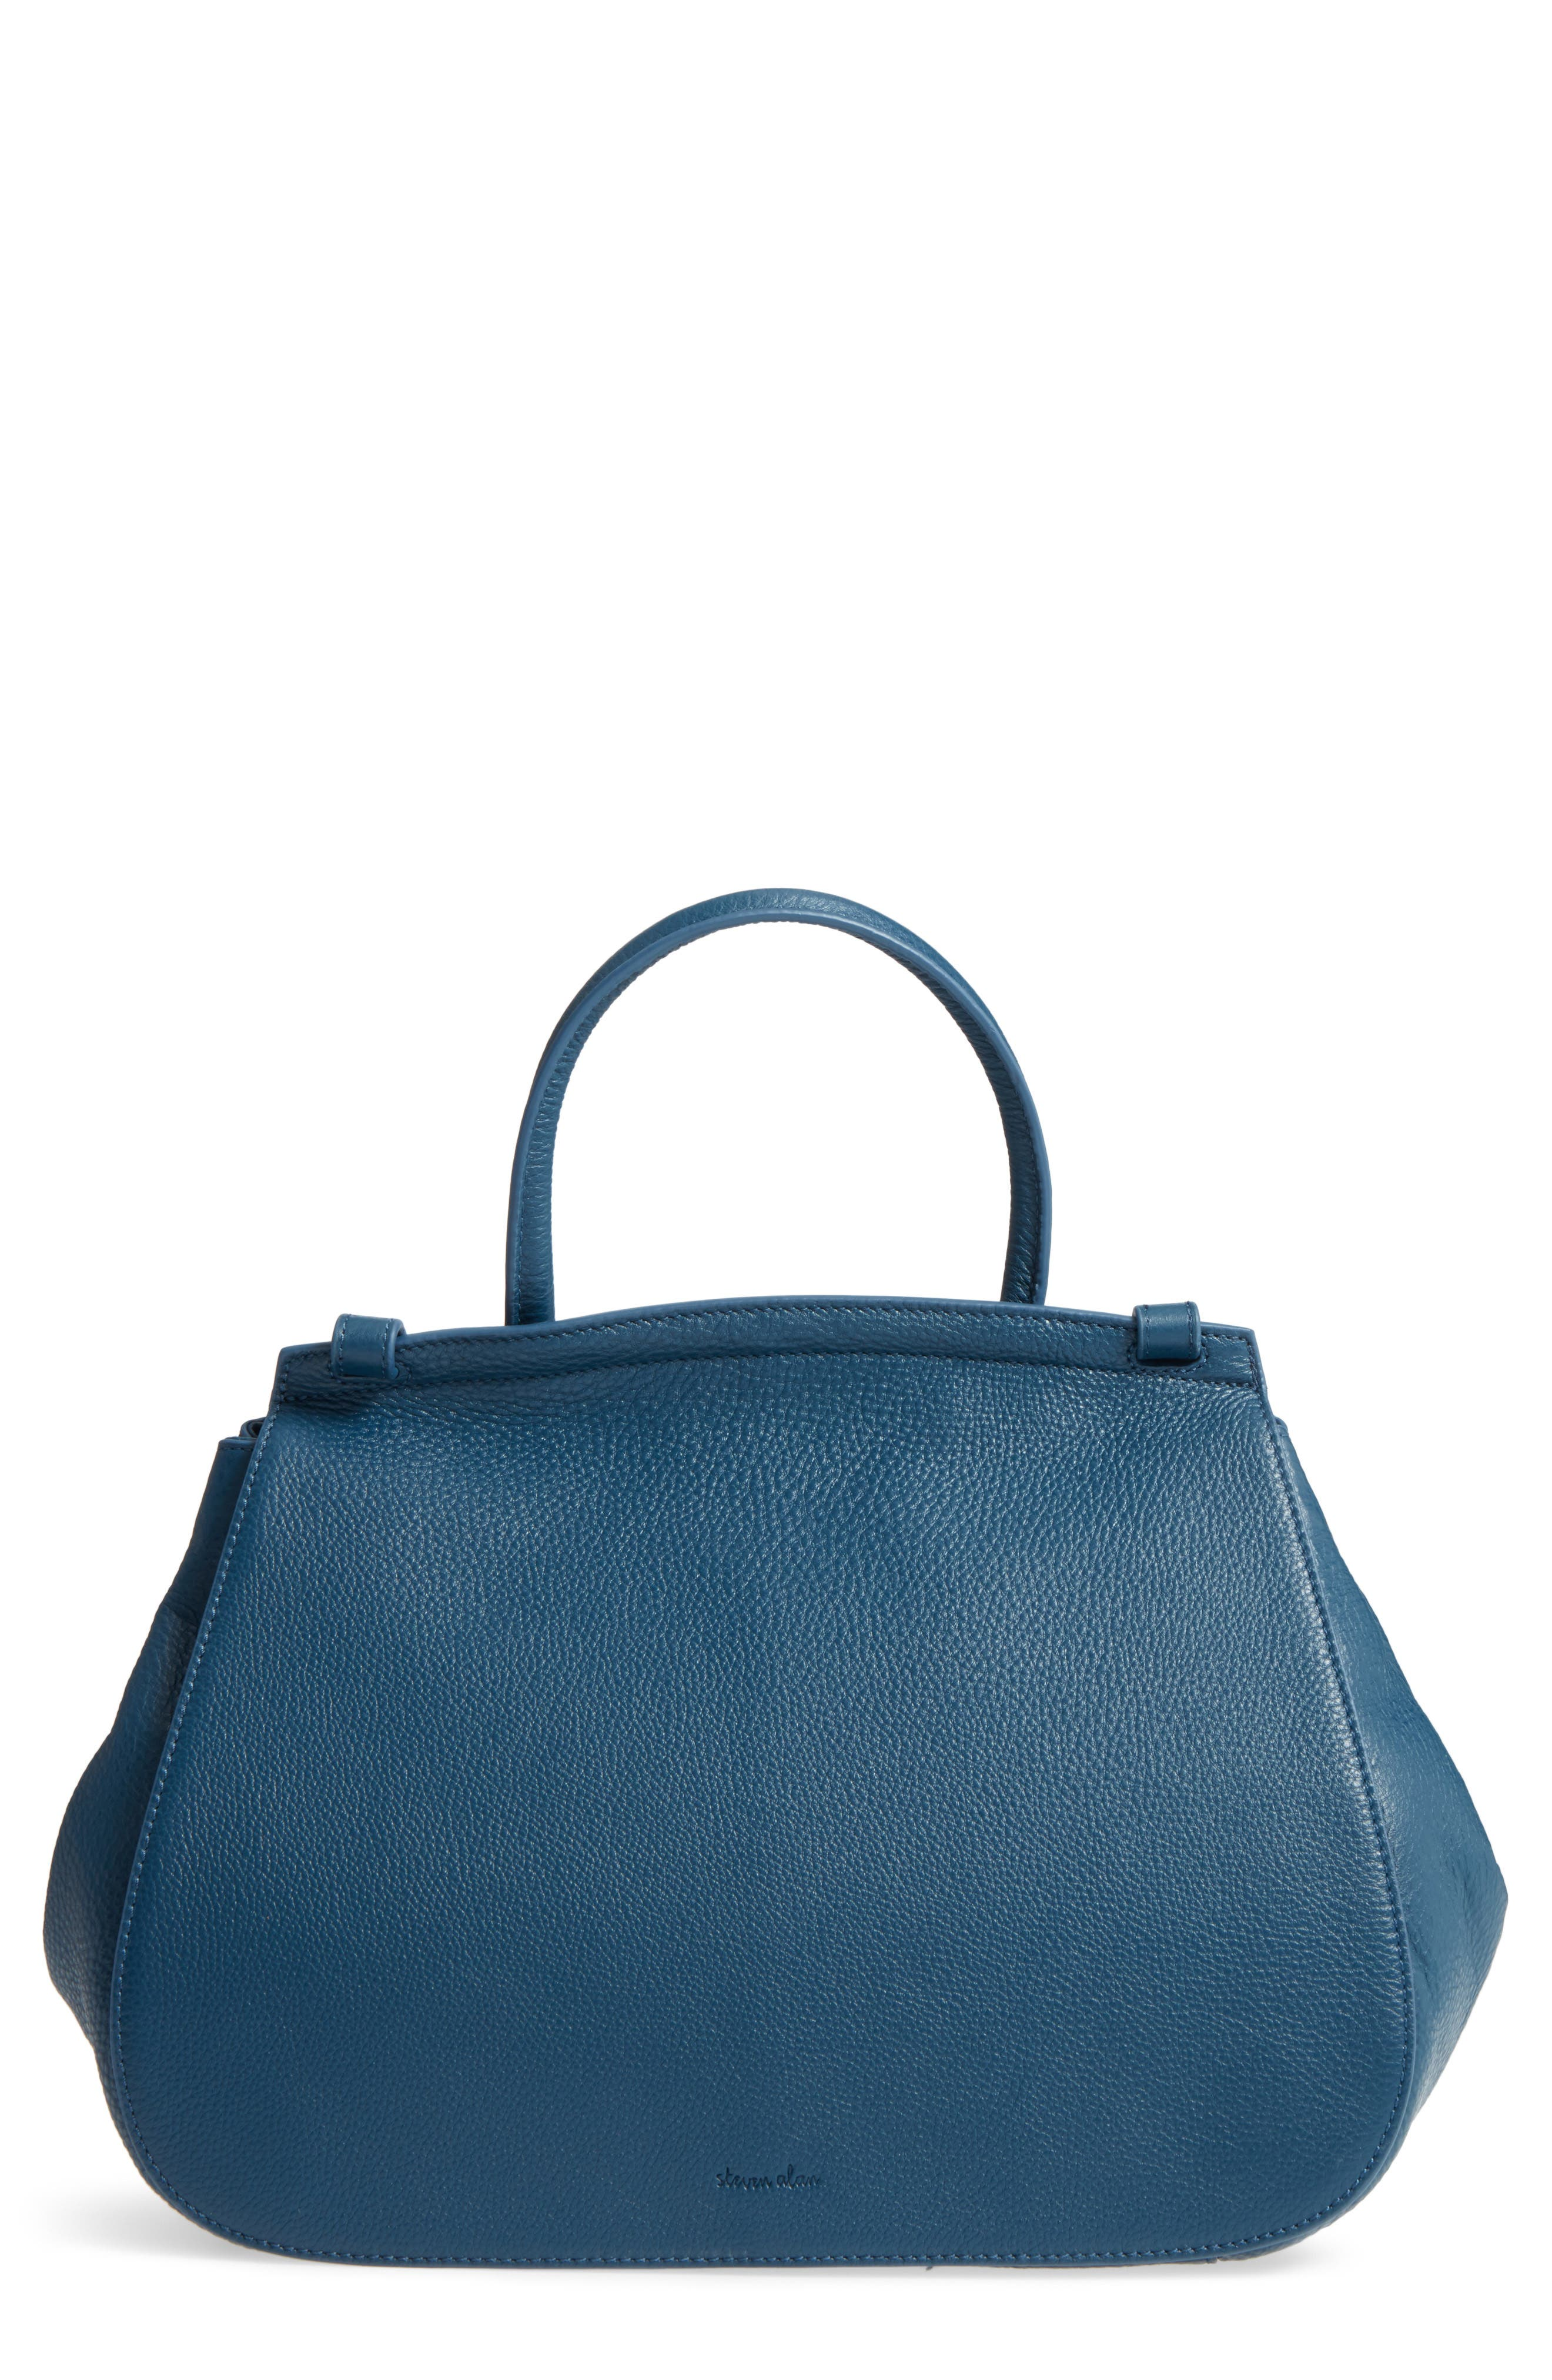 Kate Calfskin Leather Top Handle Satchel,                         Main,                         color, Navy